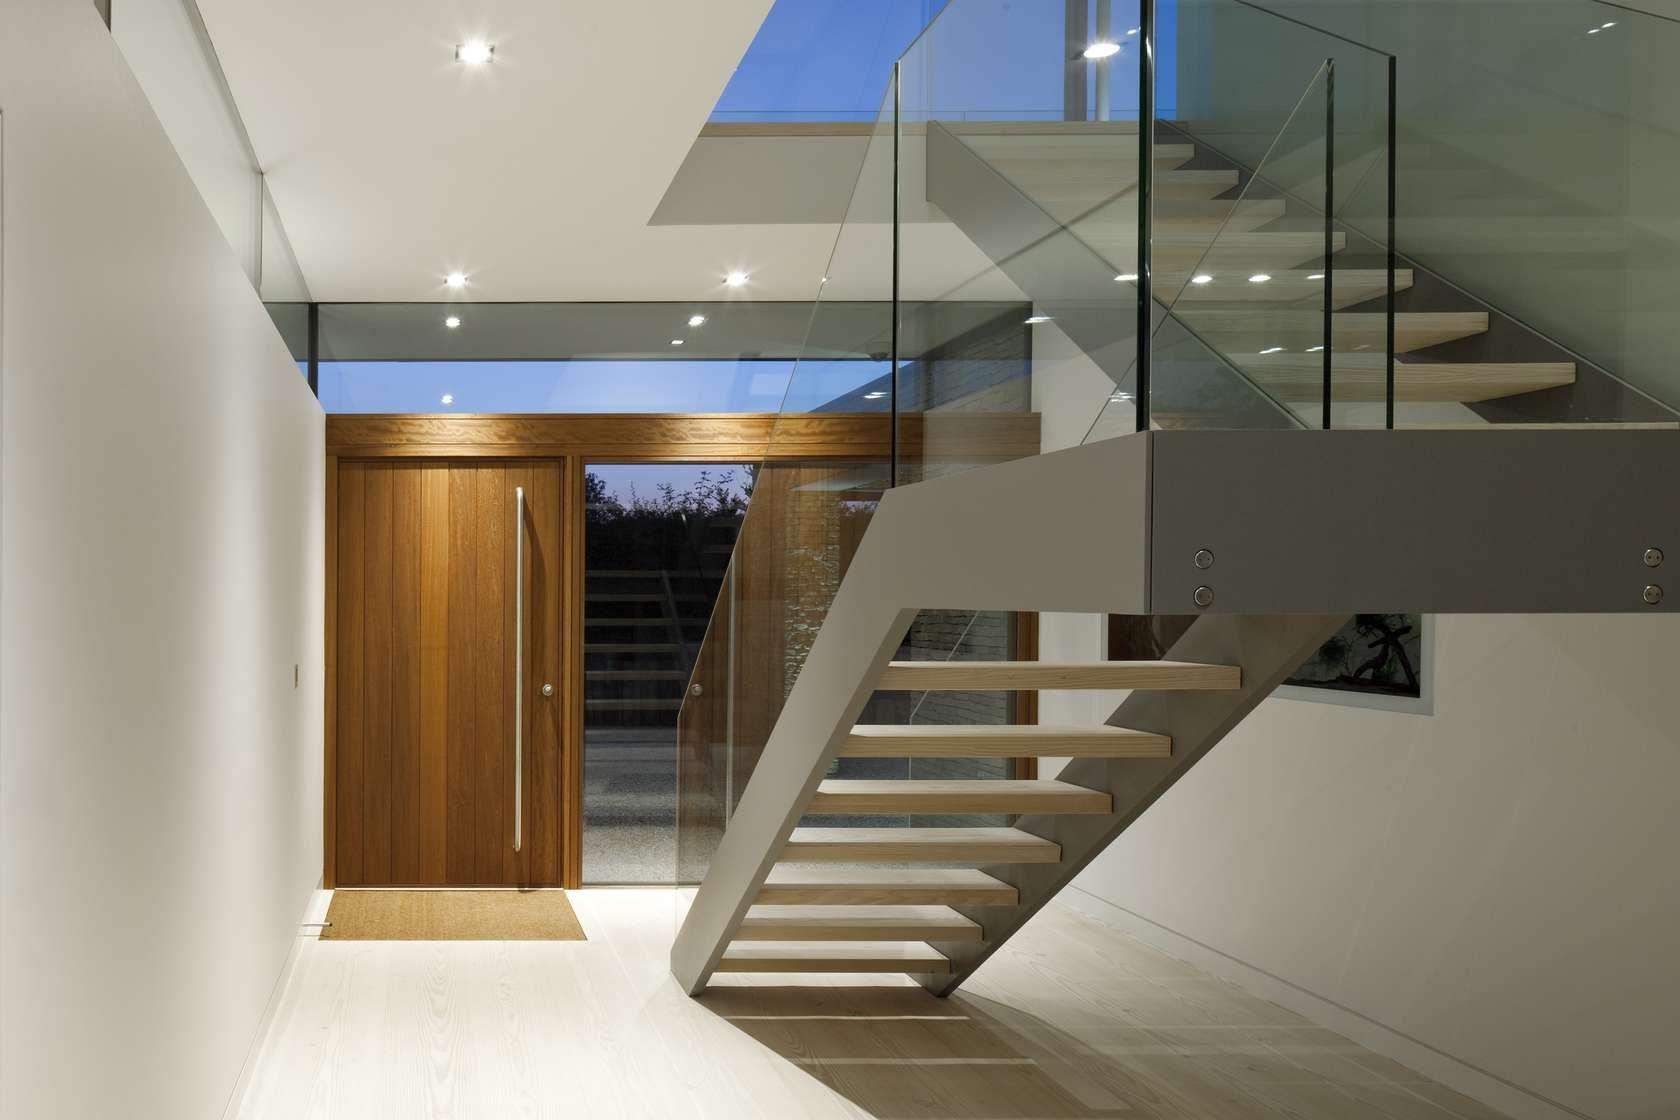 Hurst House on Architizer